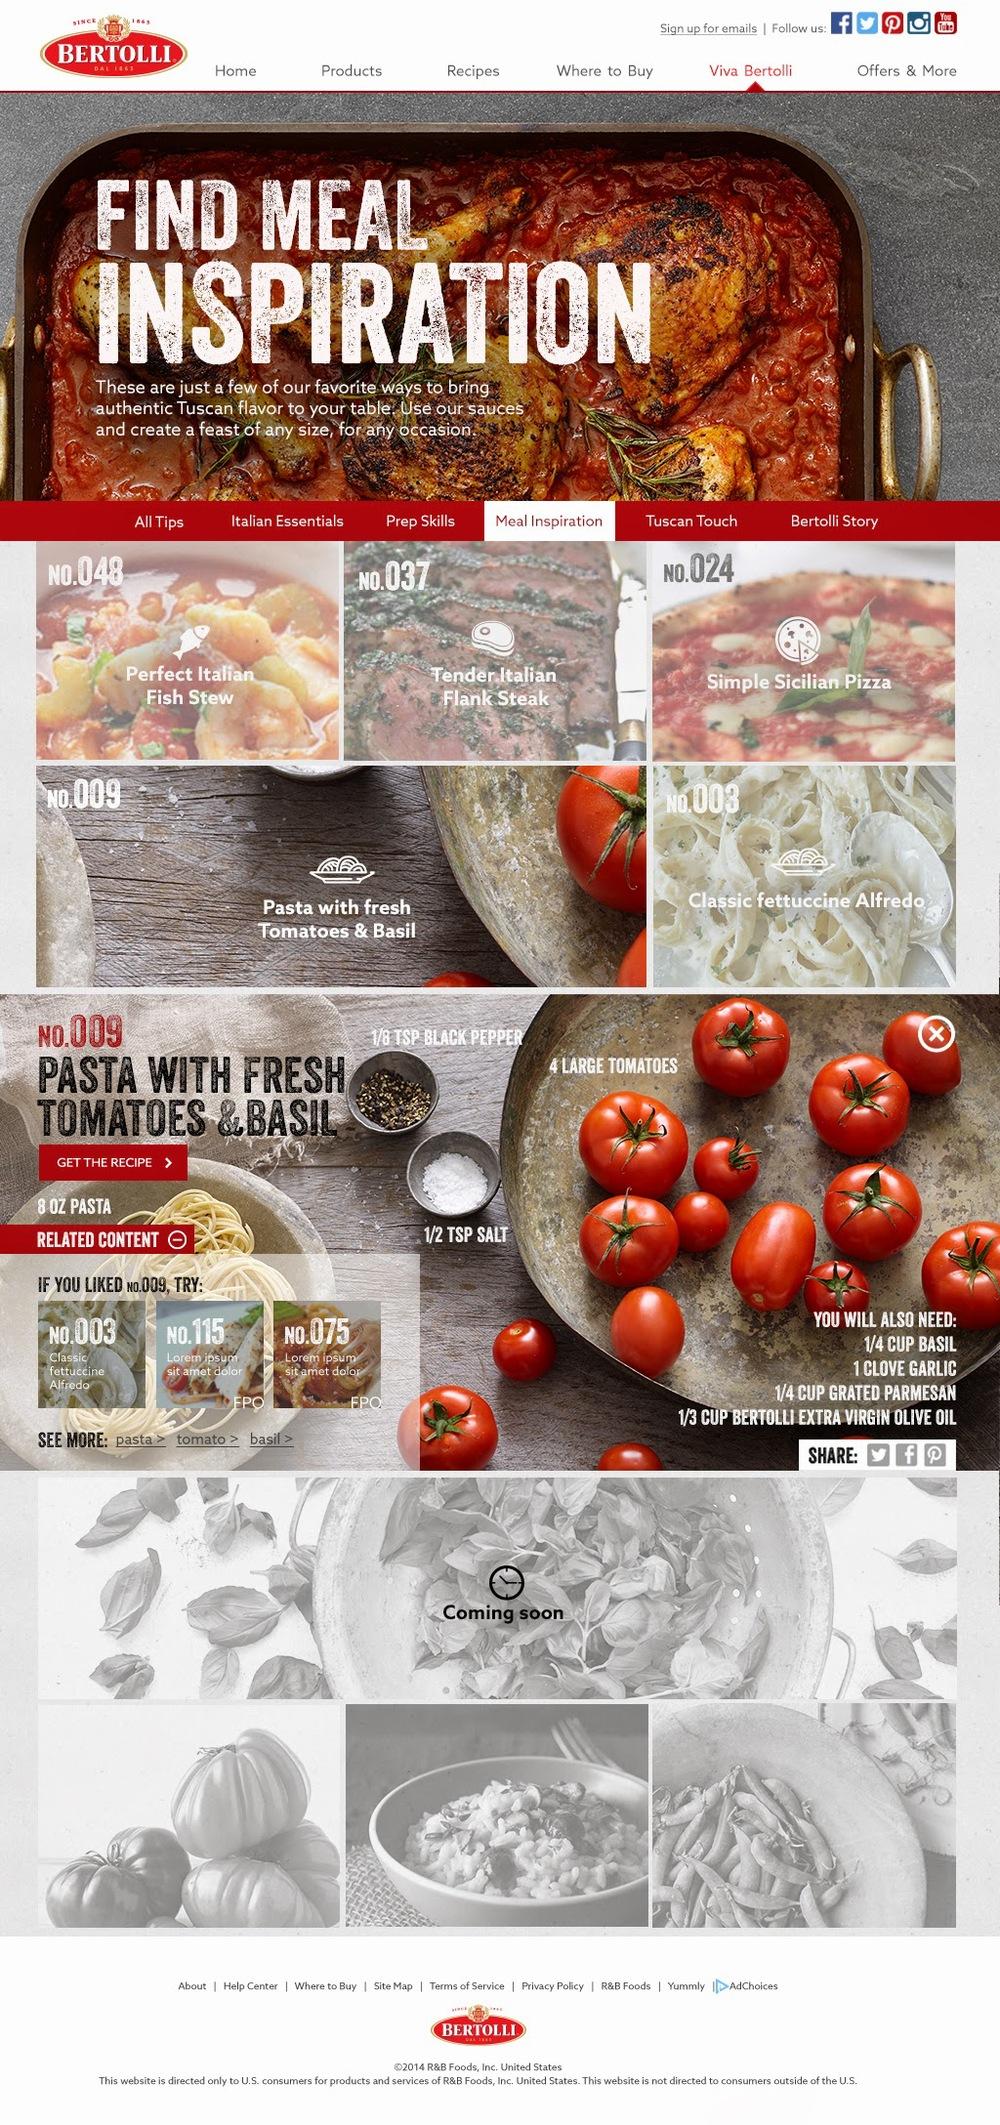 Bertollisite-post-expanded-meal-full.jpg